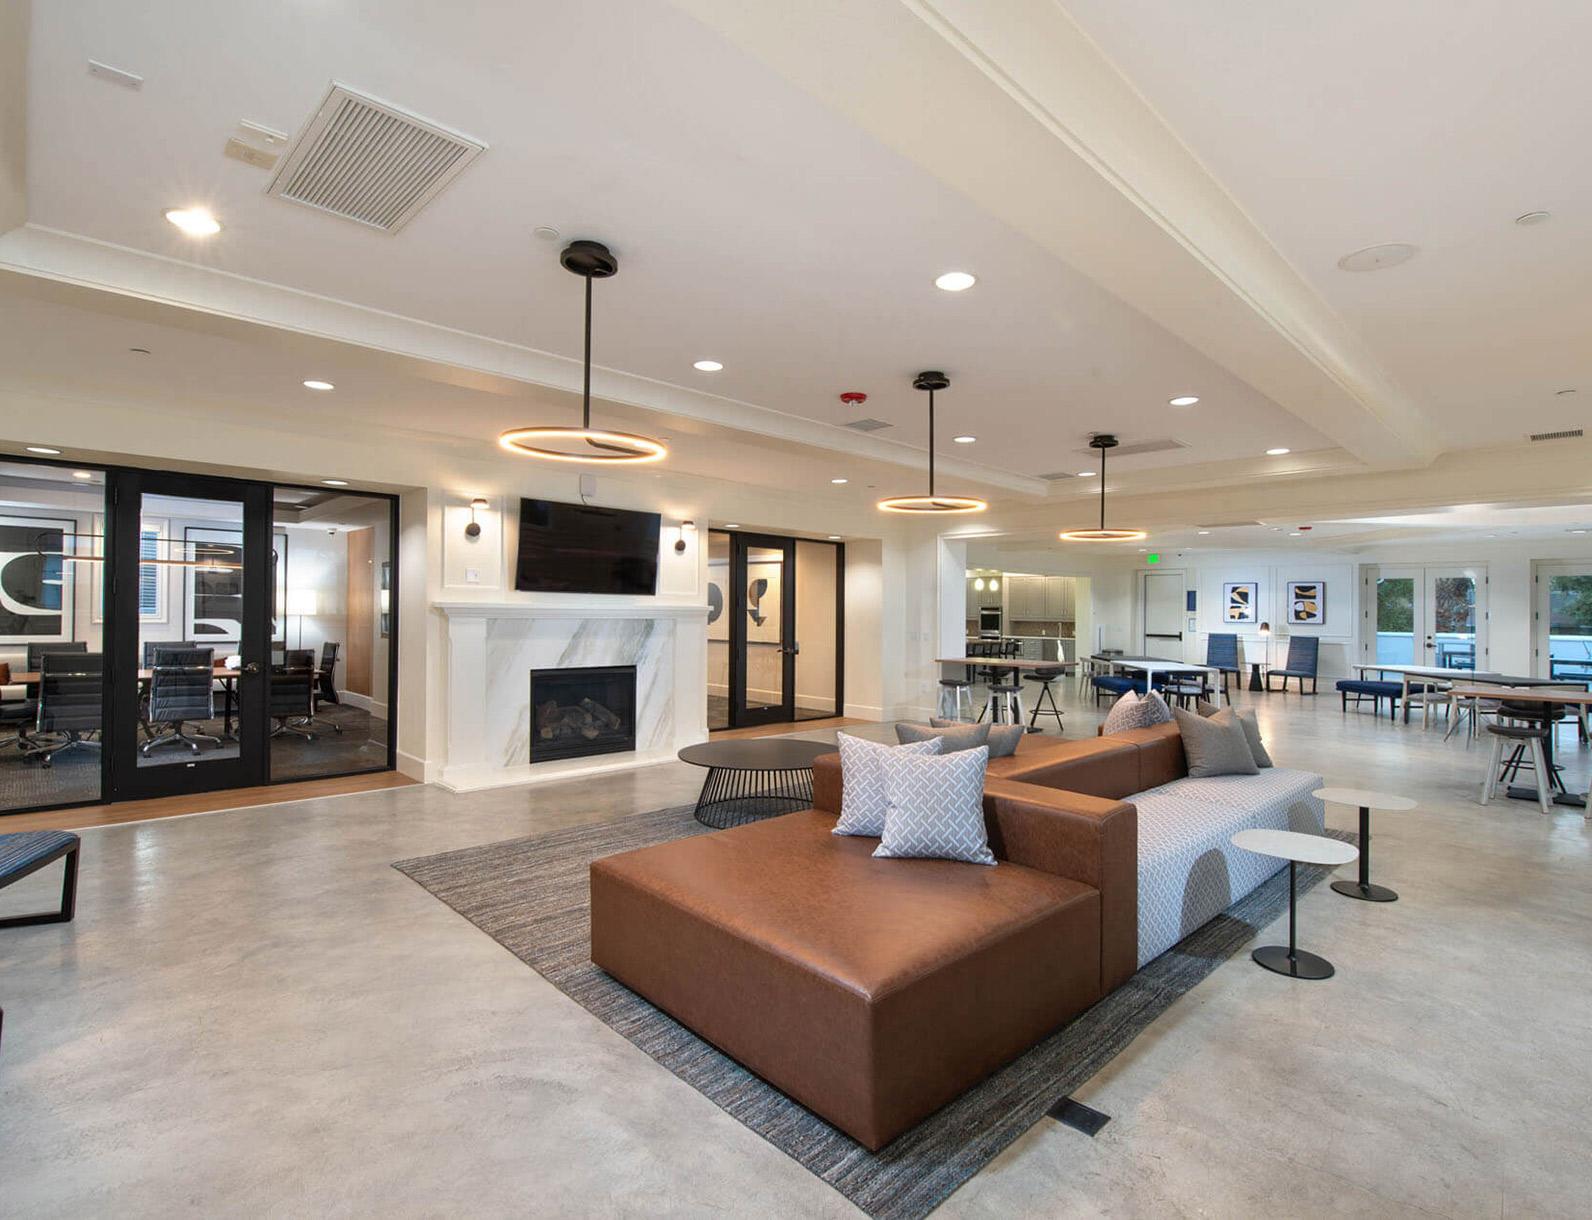 27 Seventy Five Mesa Verde for rent